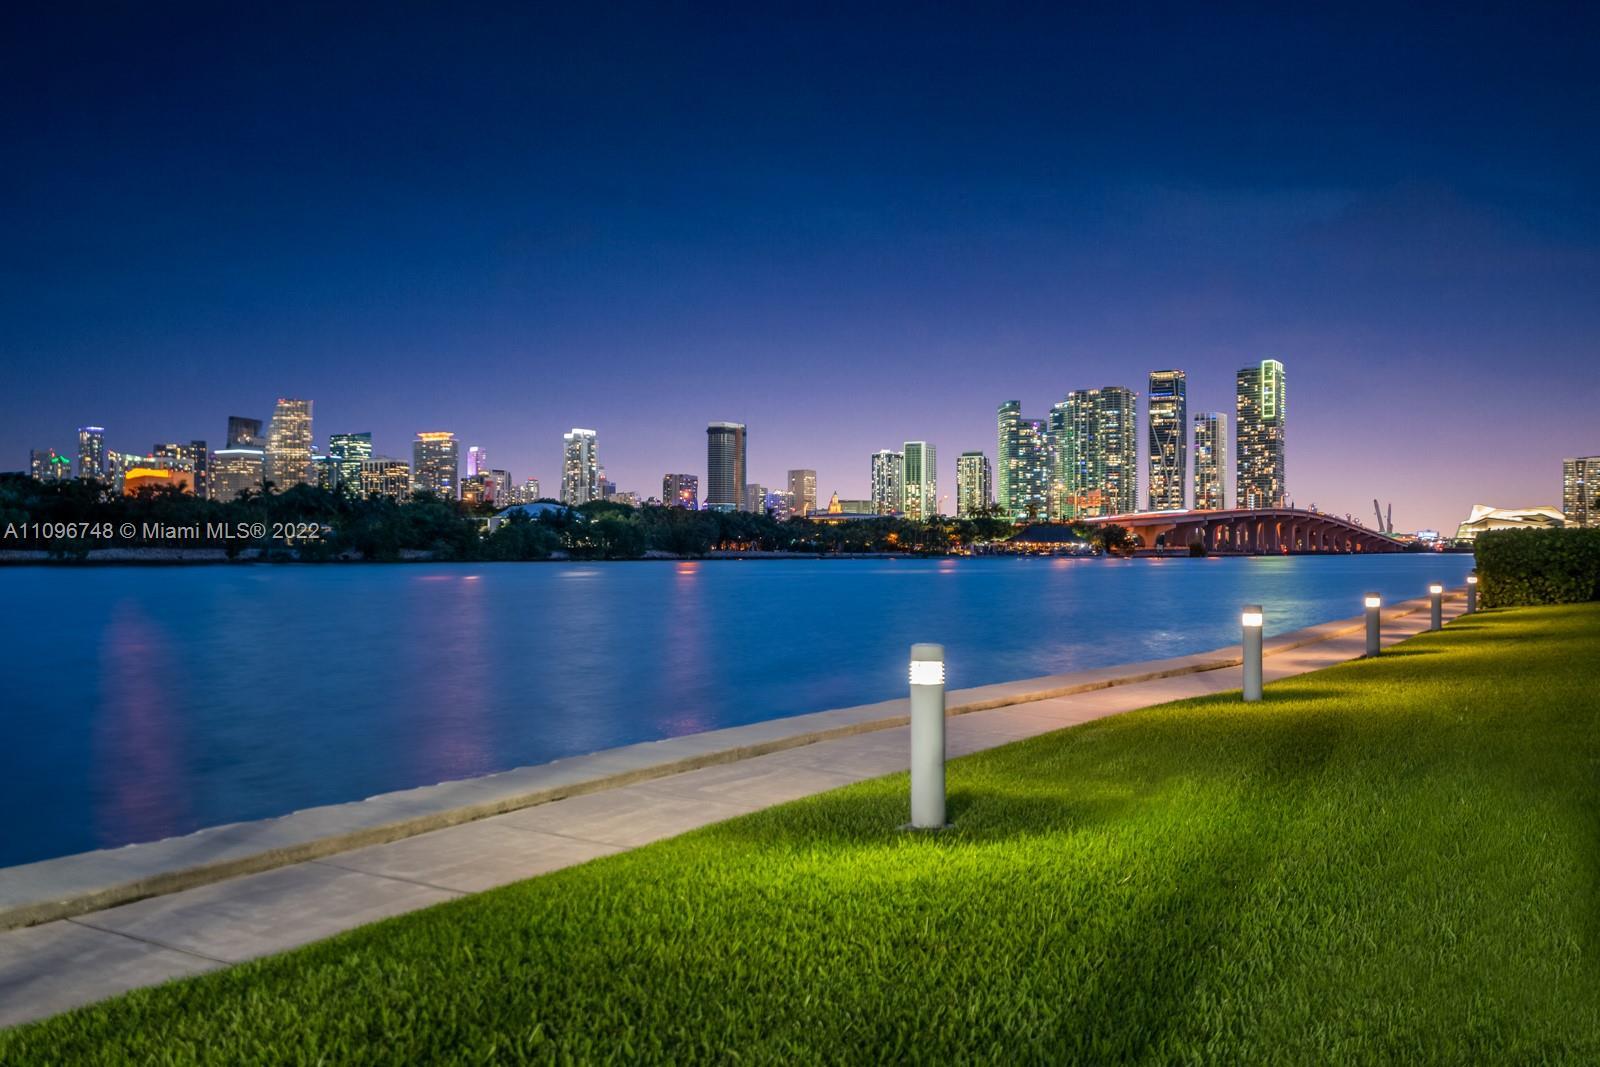 1000 Venetian Way #TH 113 - 1000 Venetian Way #TH 113, Miami, FL 33139